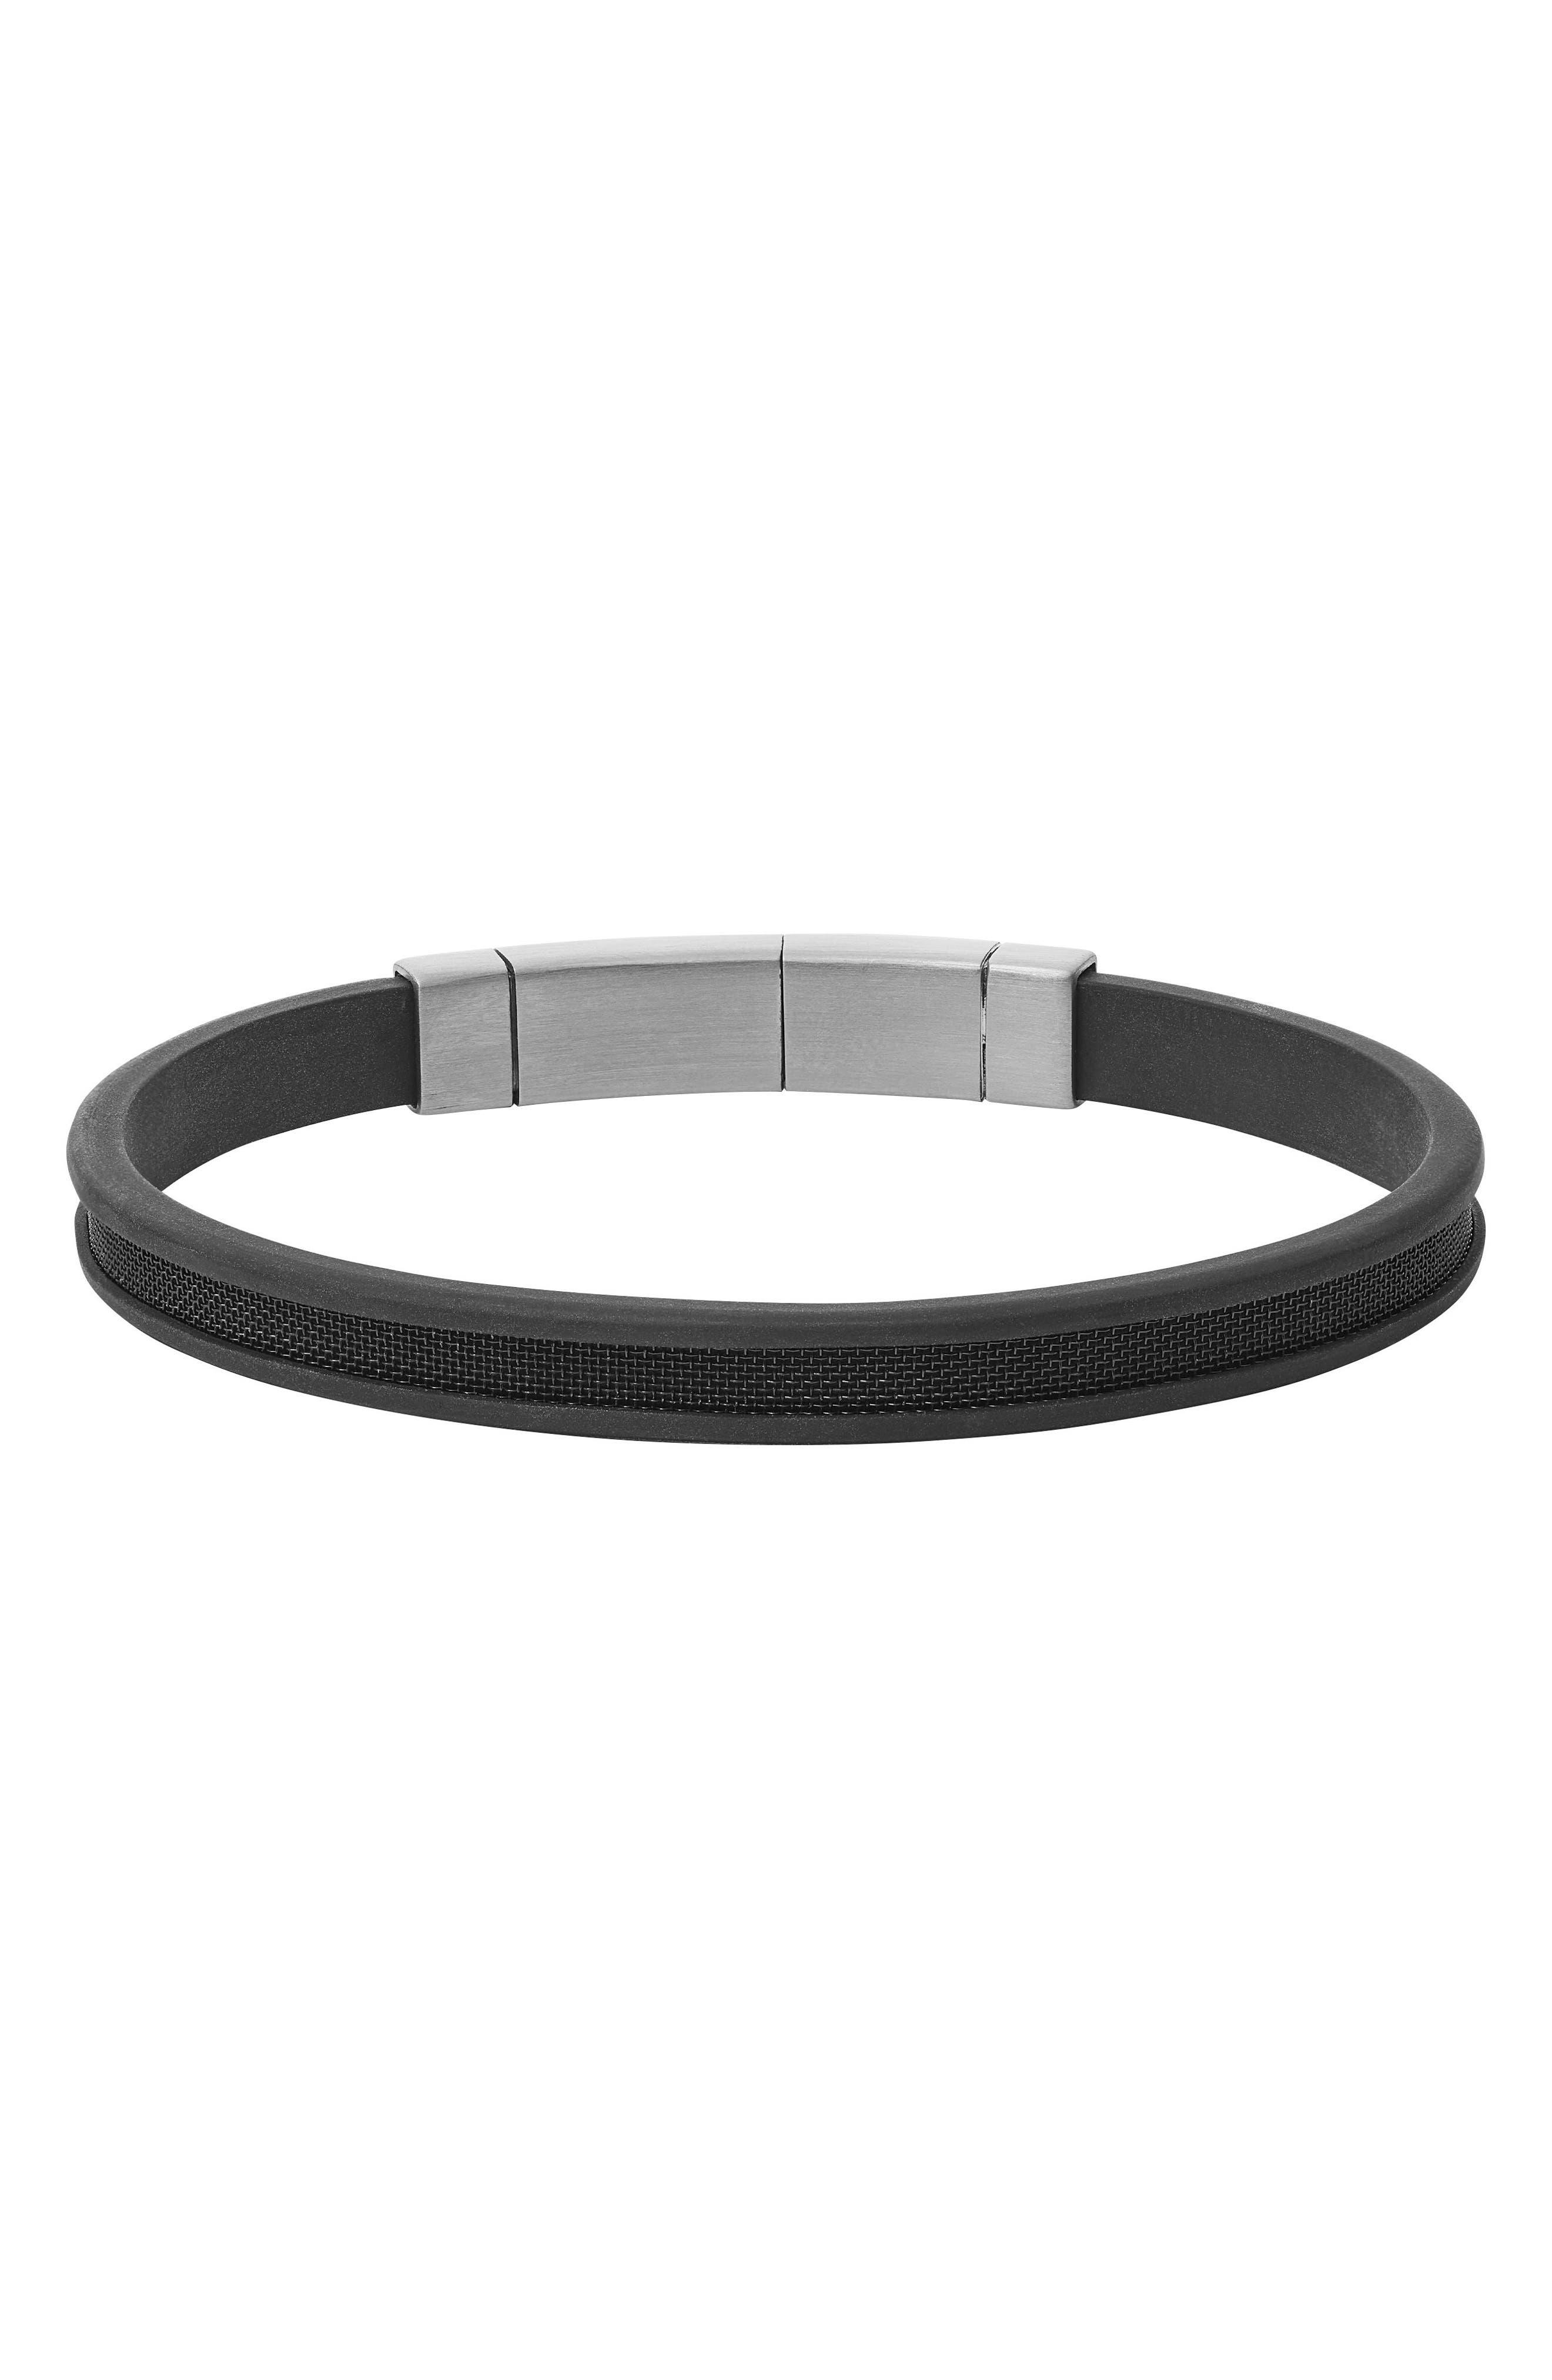 Kring Bracelet,                         Main,                         color, 018